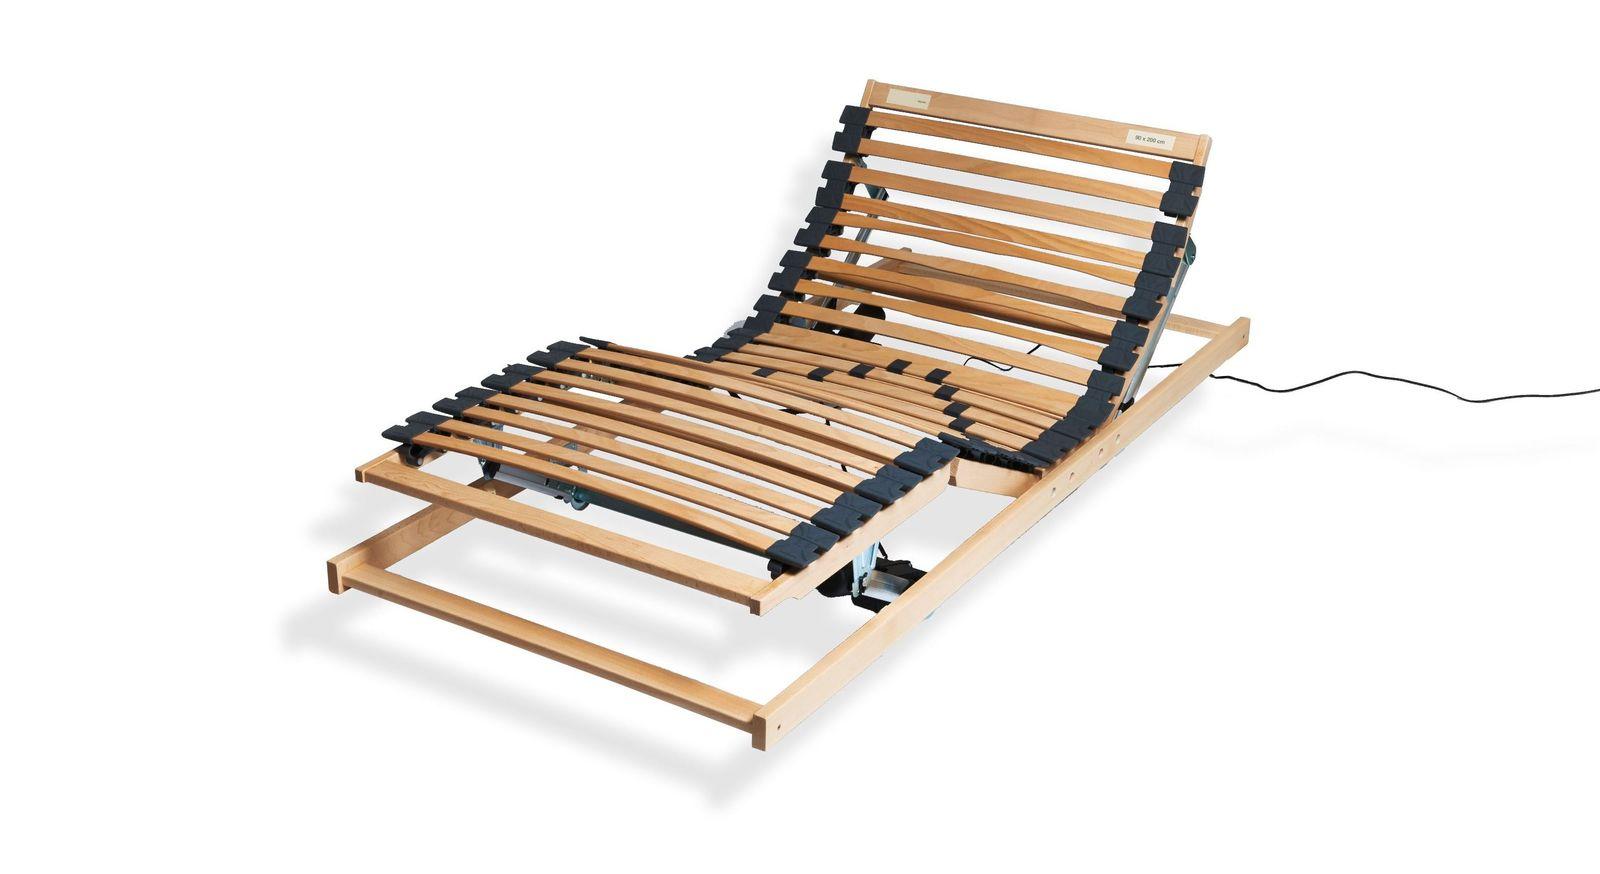 Preiswerter Lattenrost electroflex aus stabilem Holz